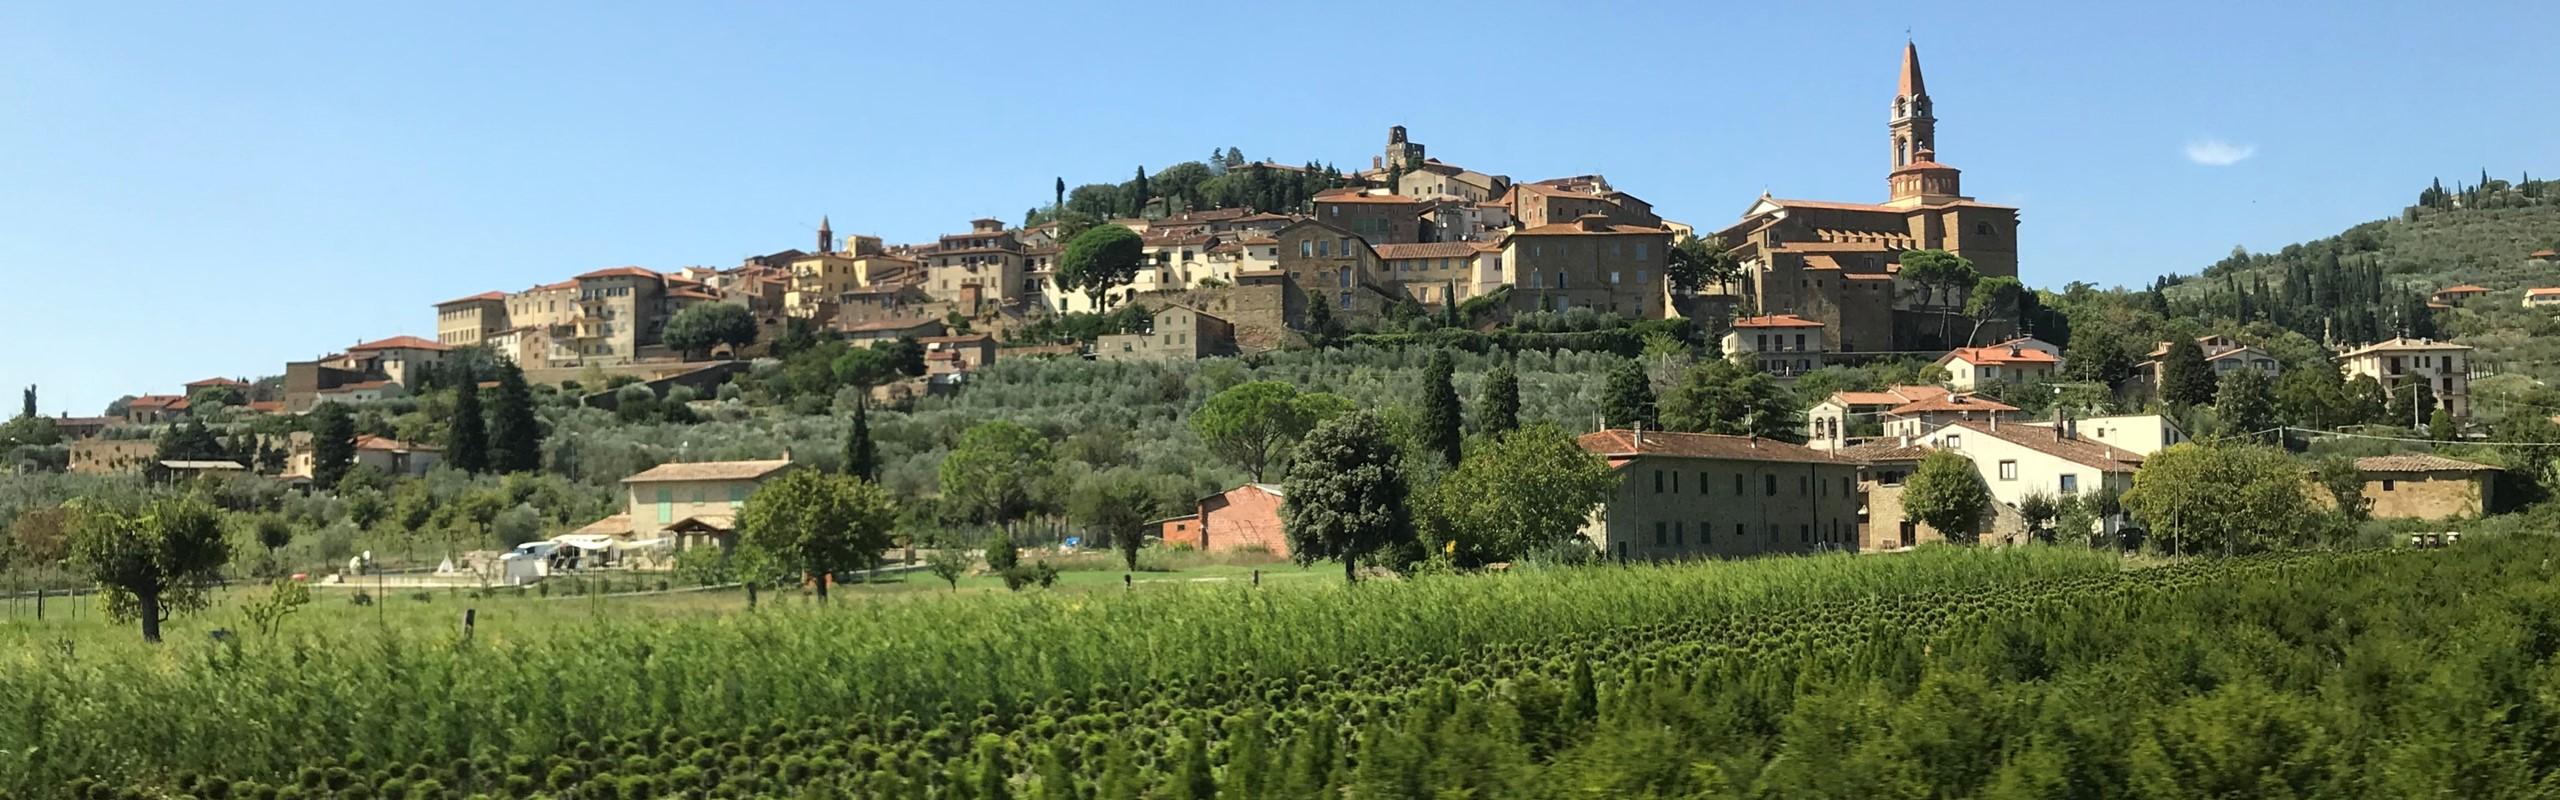 Arezzo IMG_1223 casteglion fiorentina.jpg